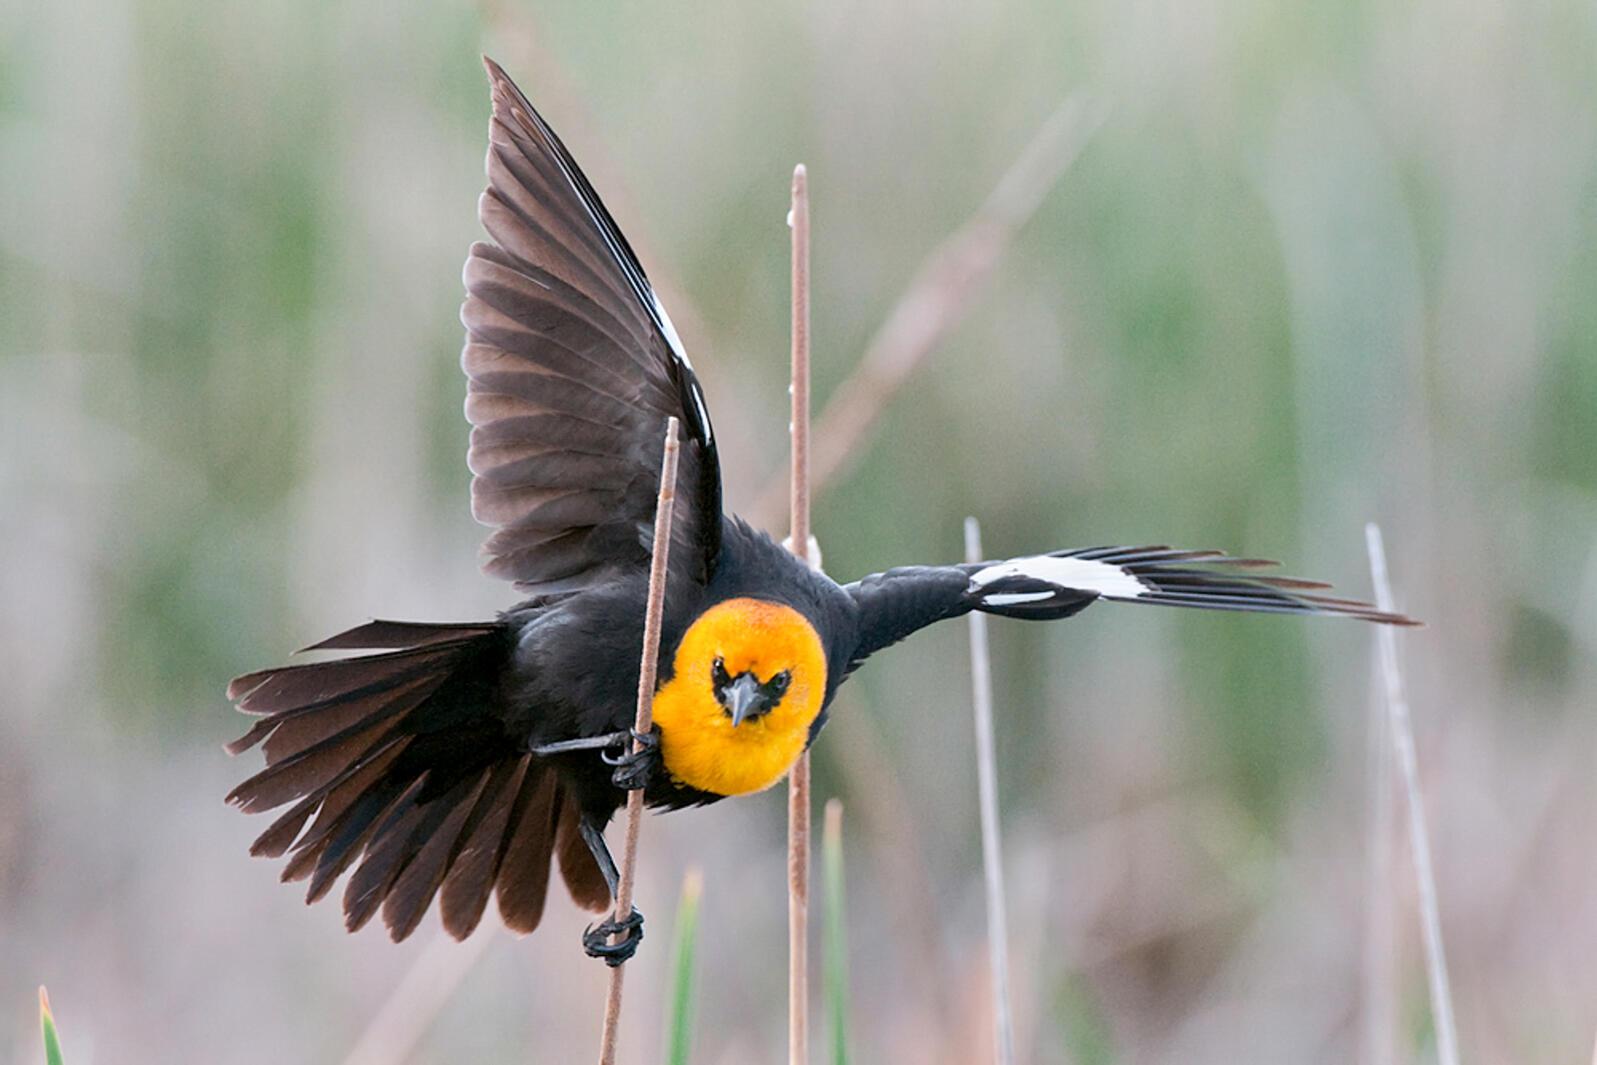 Photo of a Yellow-headed Blackbird. Credit: Gene Putney/Audubon Photography Awards